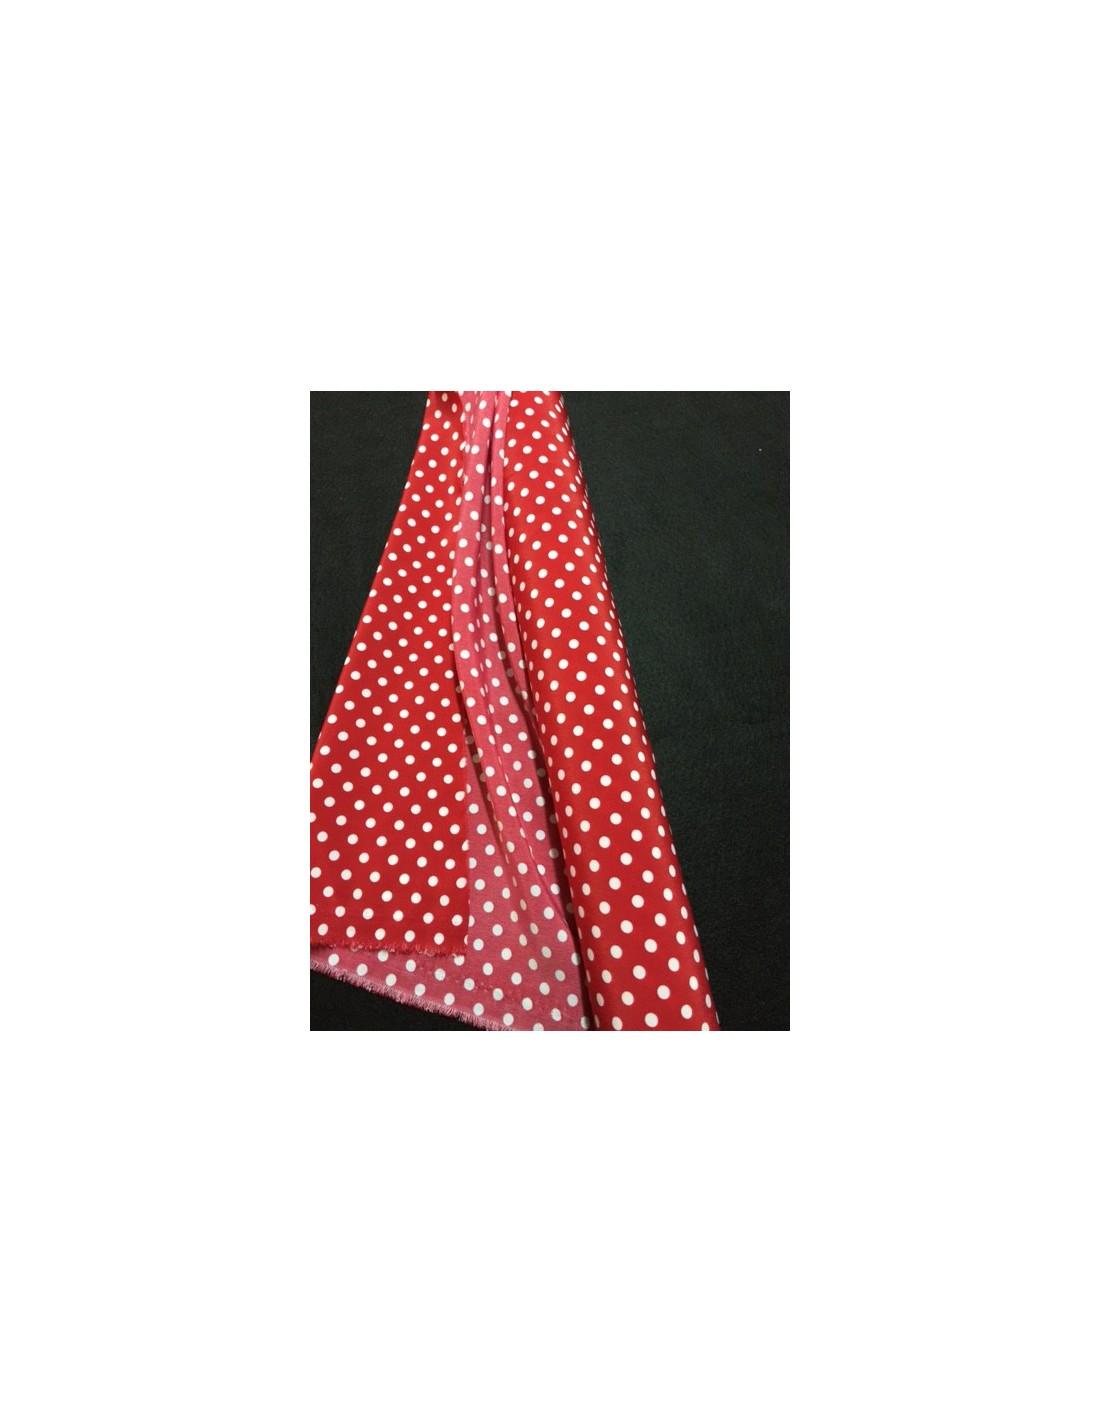 tissus rouge a pois blanc robe leonie dans ducobu tissus polyester tissus habillement. Black Bedroom Furniture Sets. Home Design Ideas